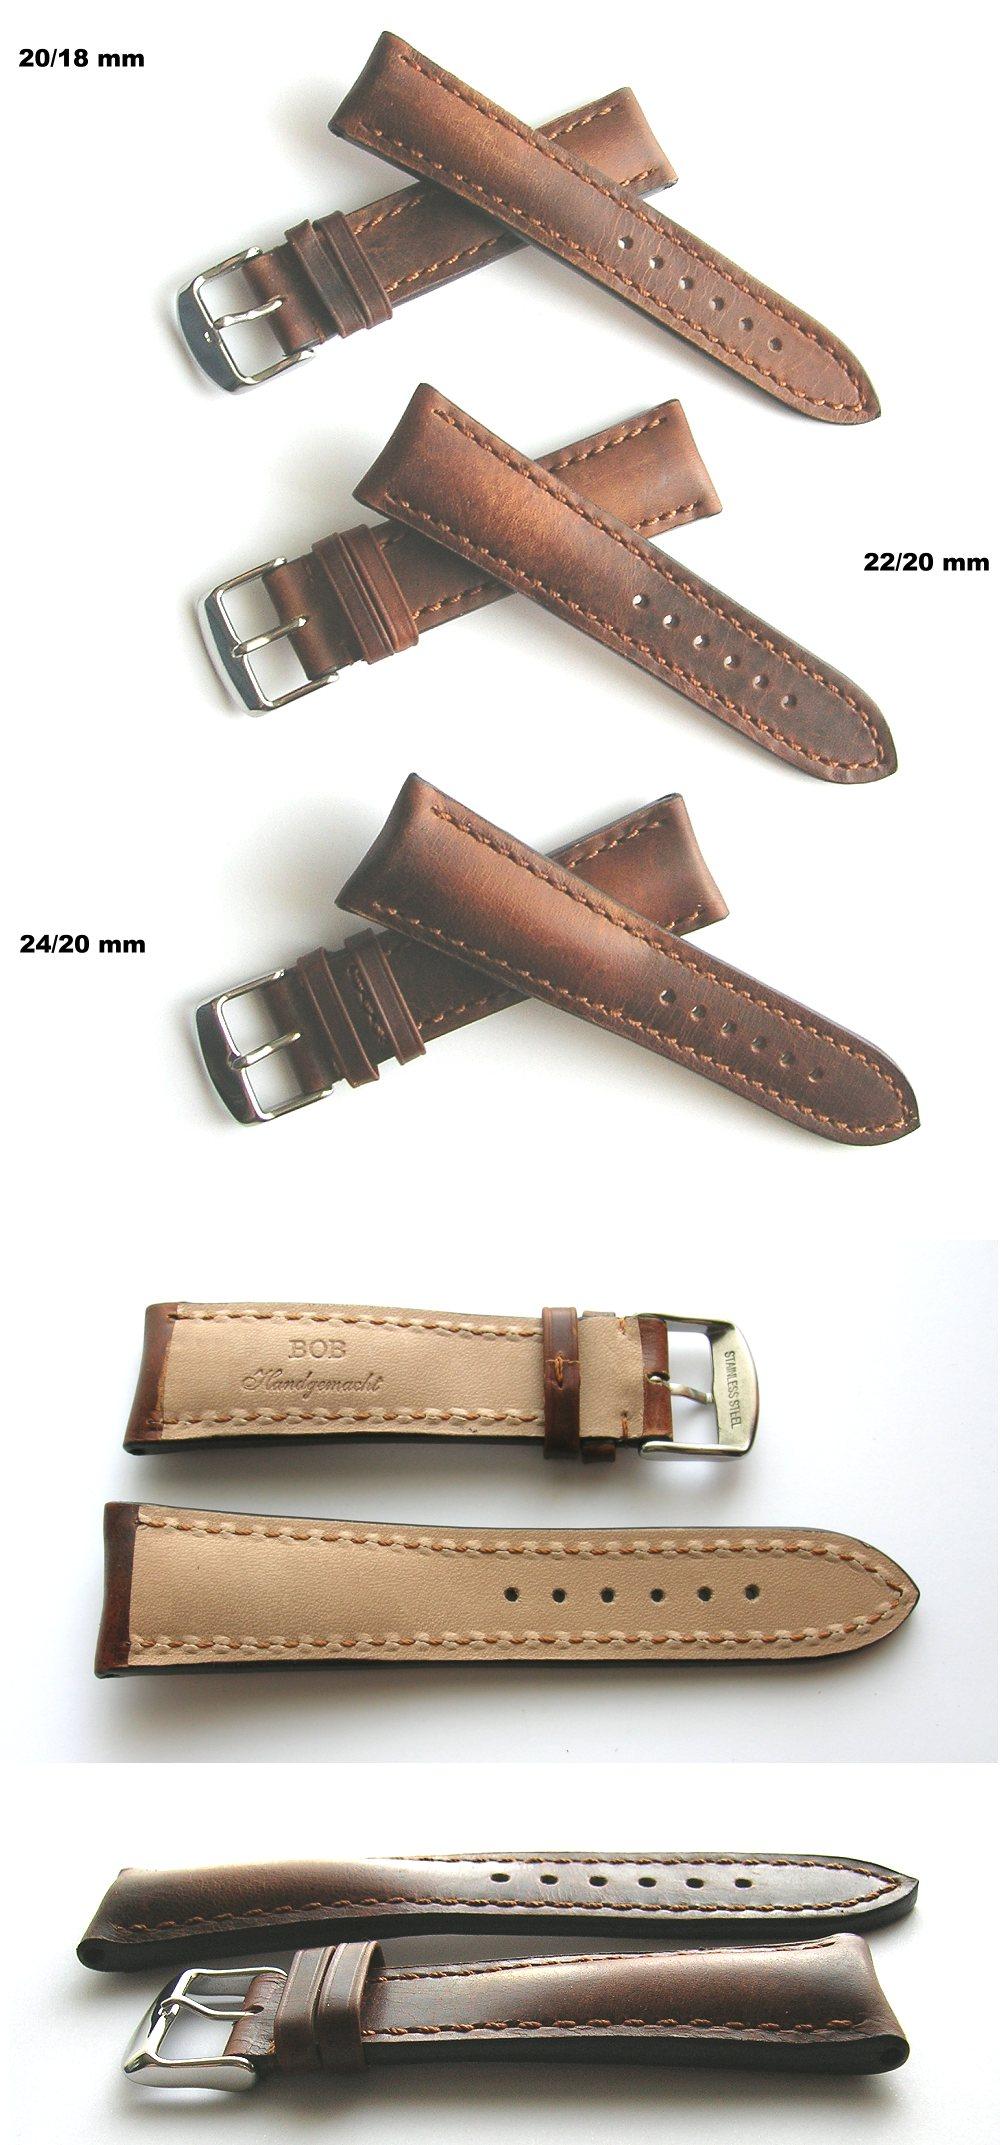 Federstege cognac//braun ohne Naht 20mm inkl Echt Leder *Vintage* Uhrenarmband